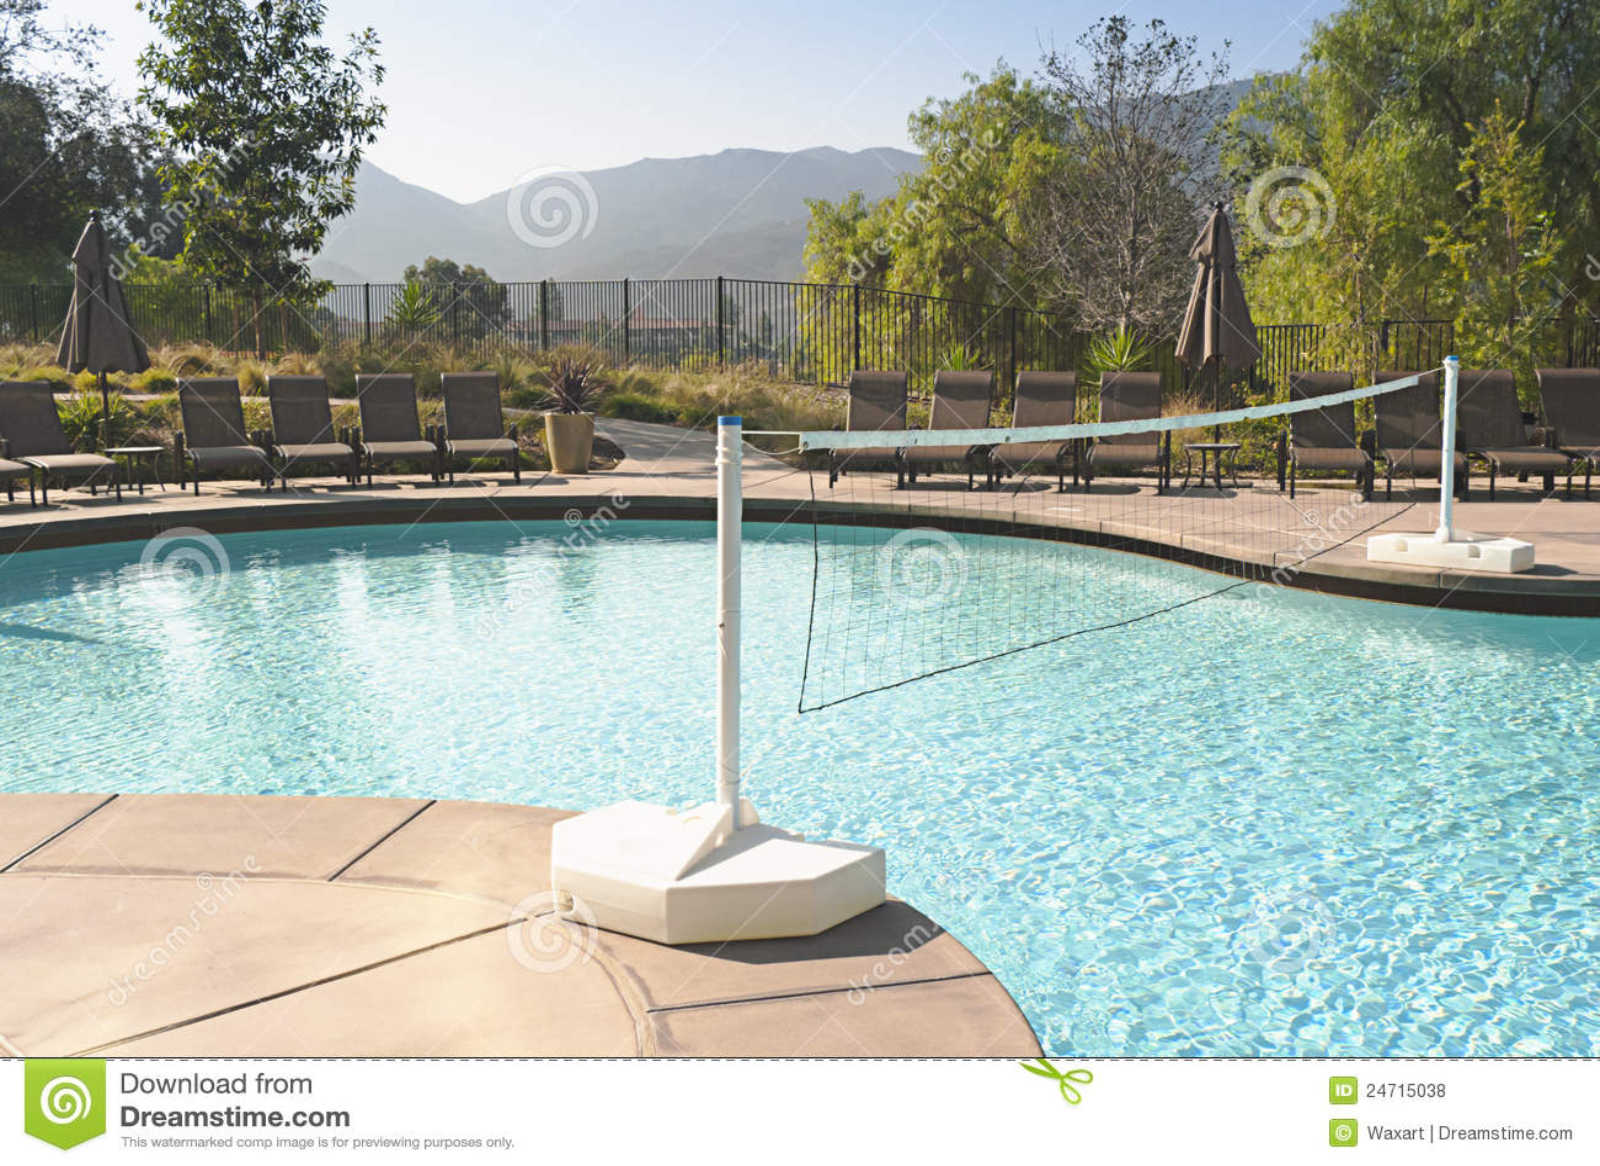 swimmingpool mit volleyballnetz lizenzfreie stockfotos. Black Bedroom Furniture Sets. Home Design Ideas